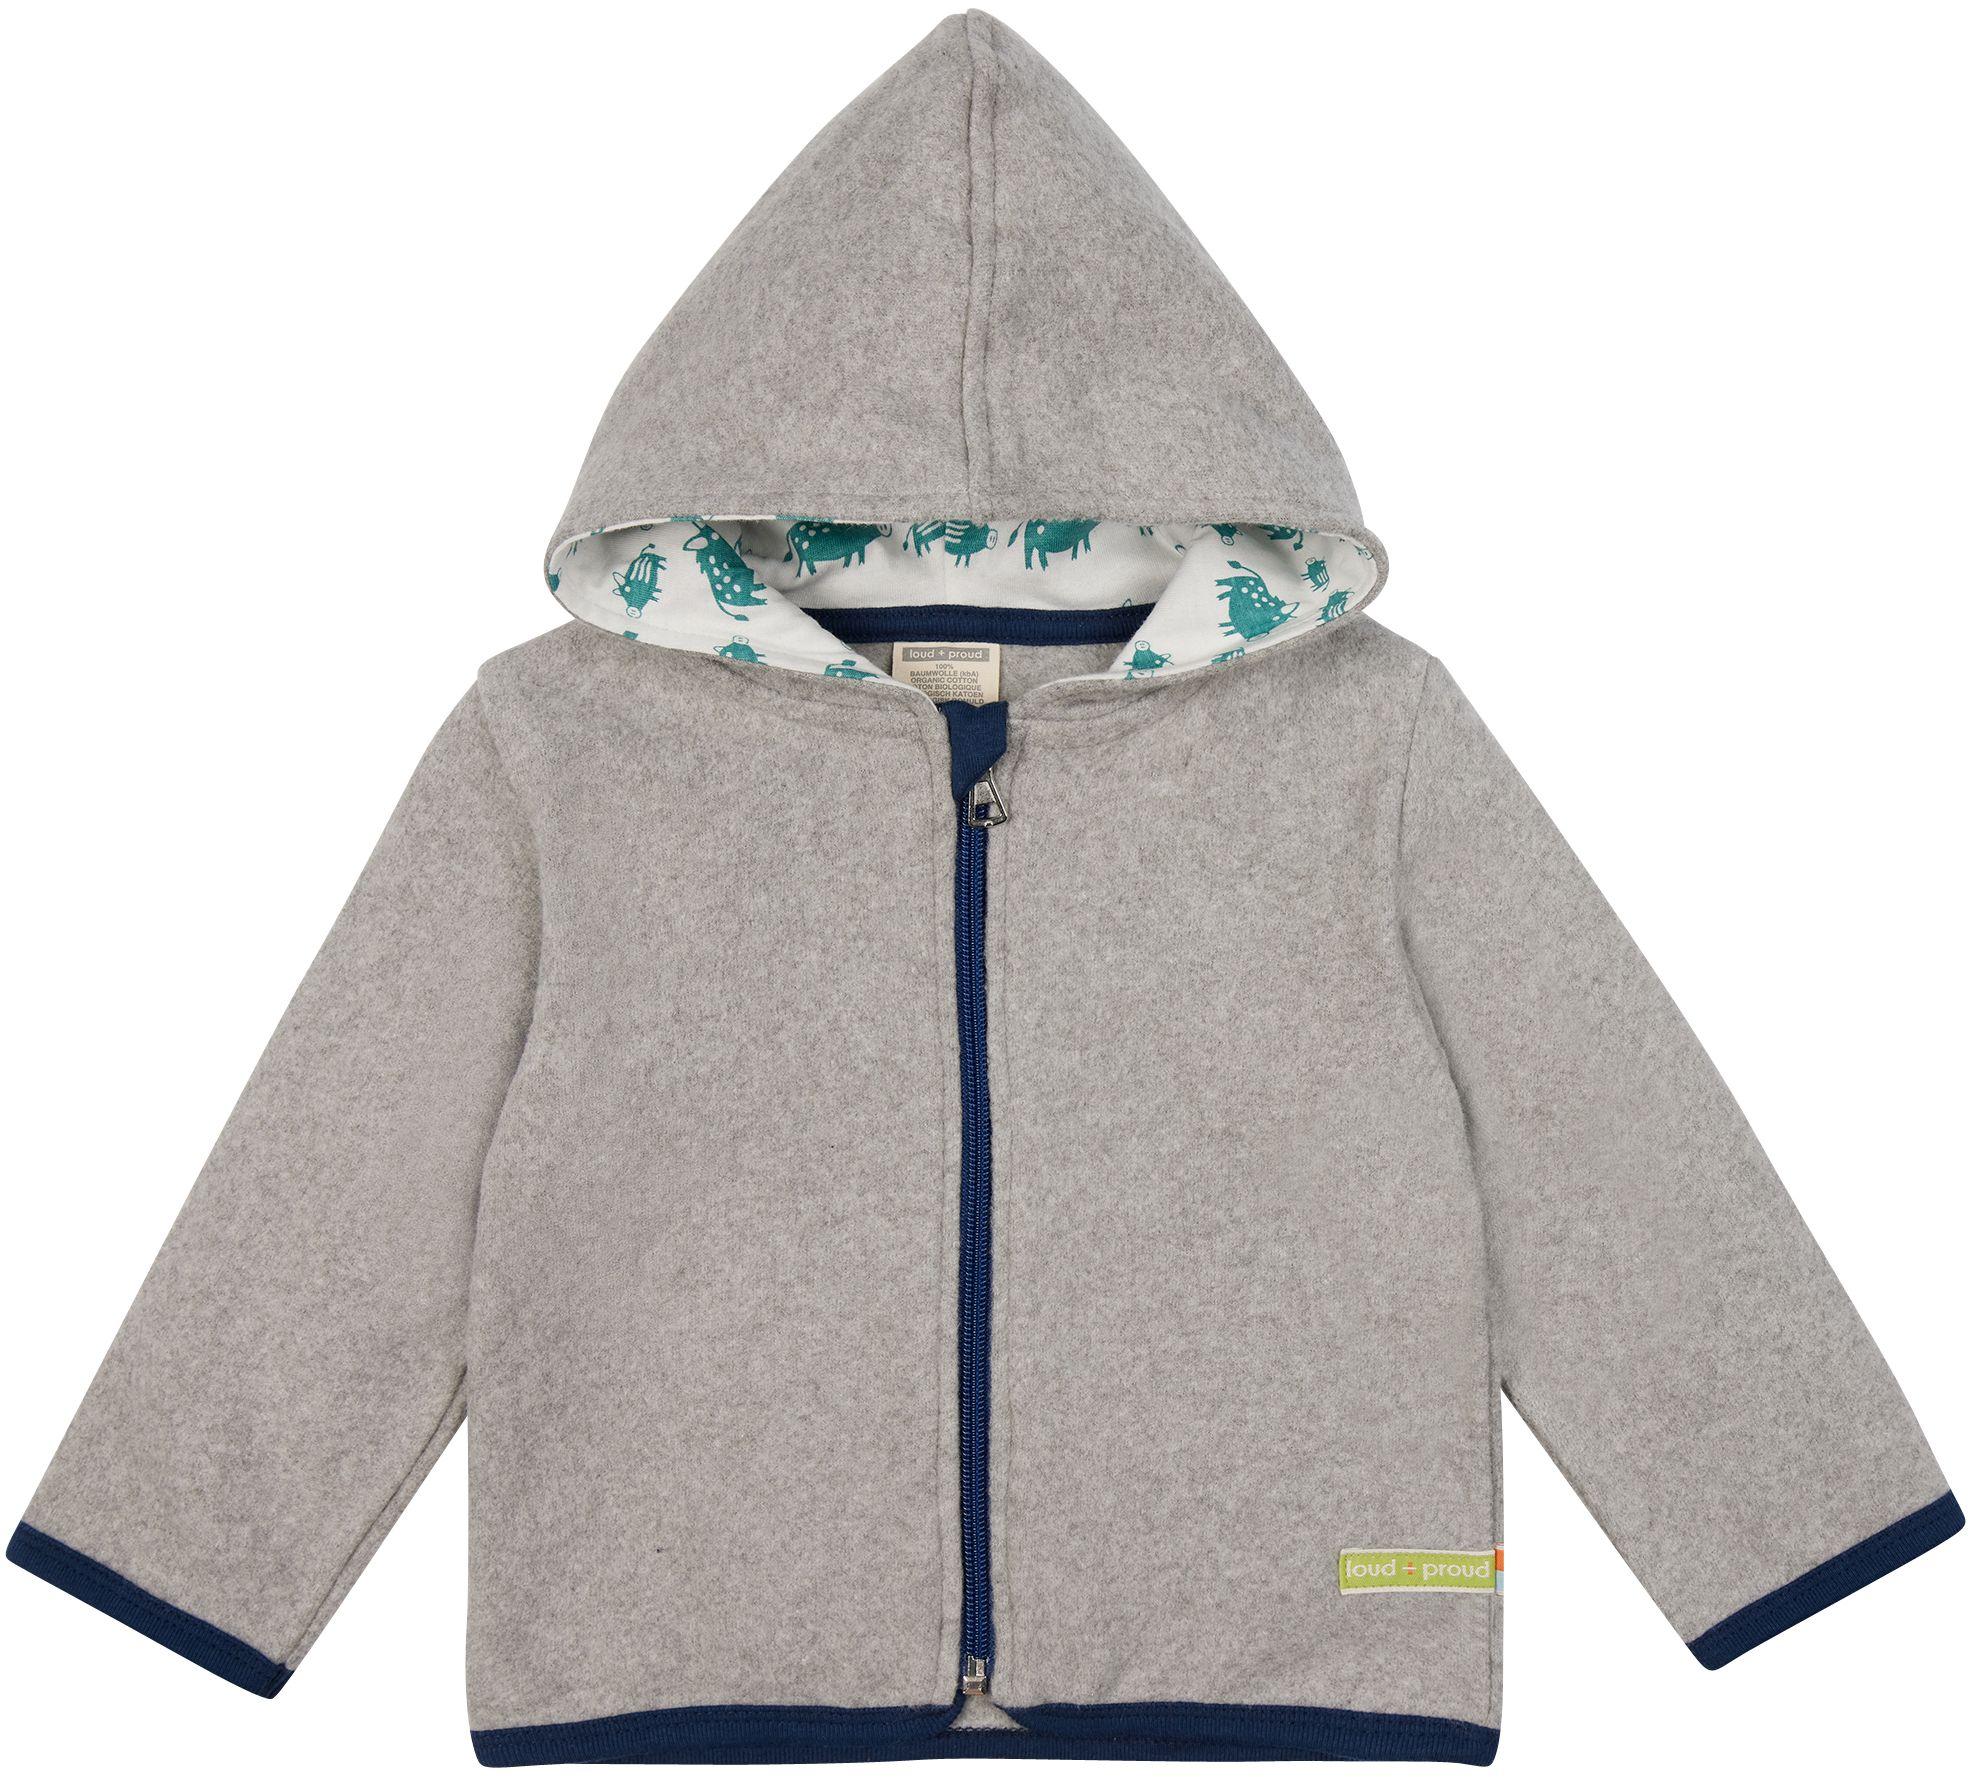 Fleece-Jacke für Kinder in Grau